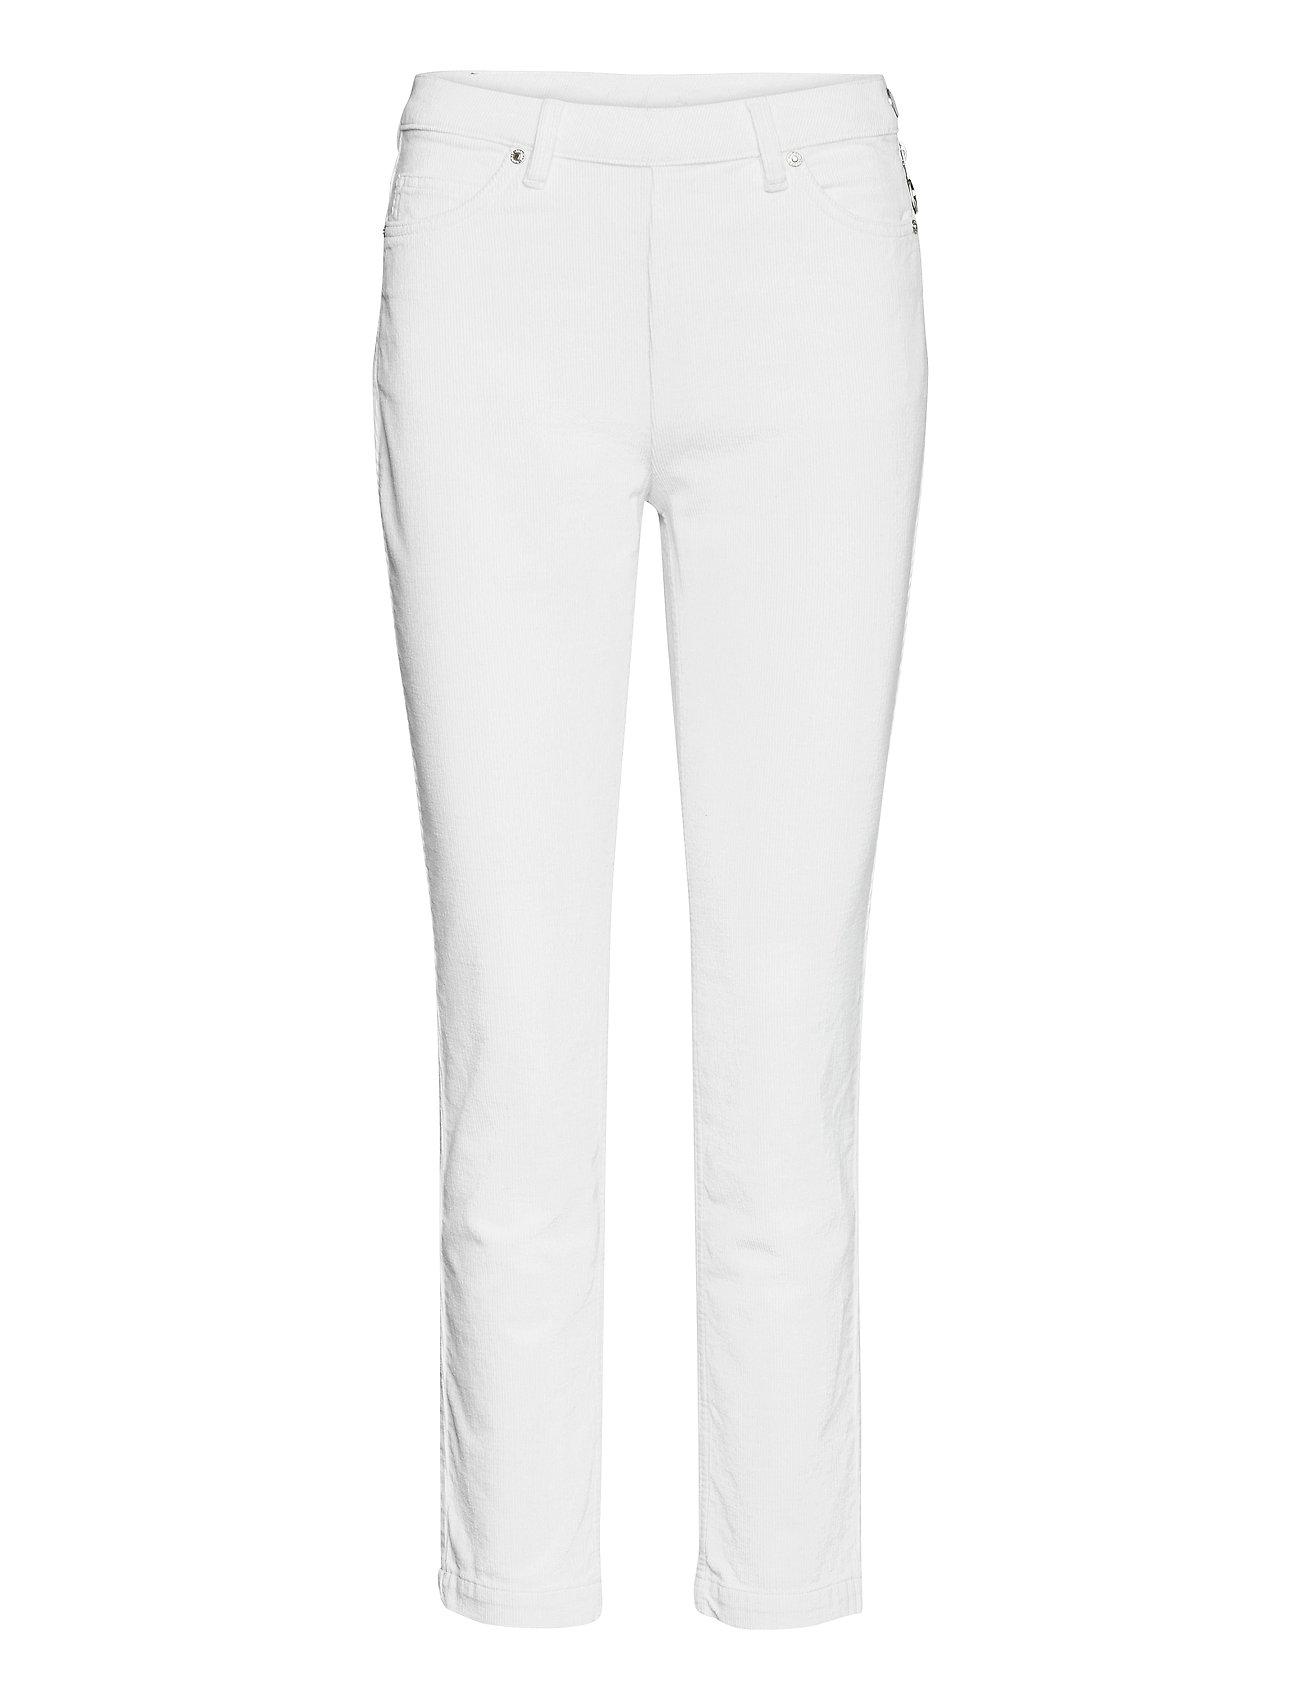 2nd Jeanett Cord Slim Jeans Hvid 2NDDAY